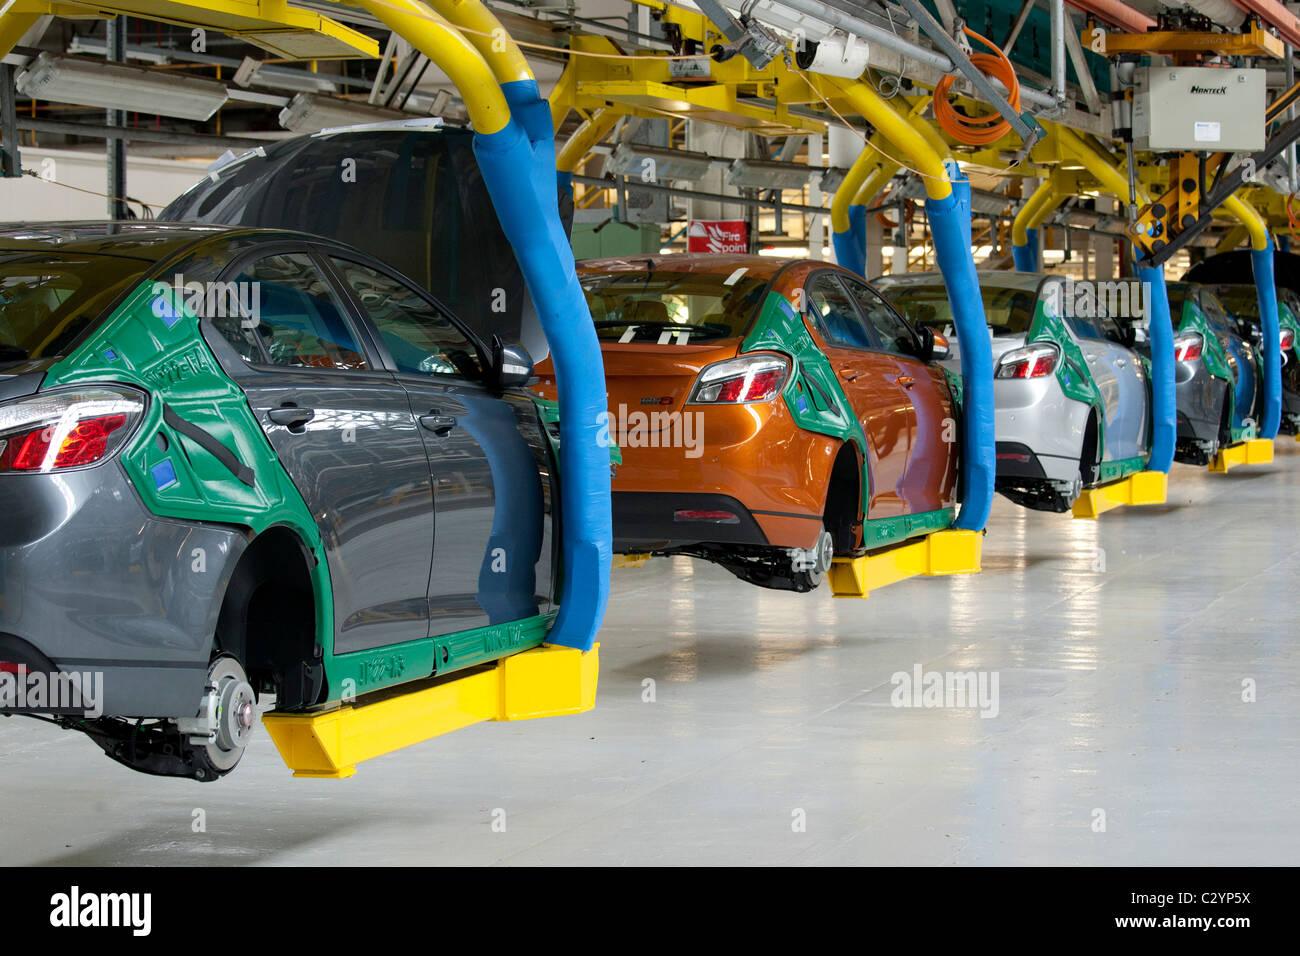 Production line of the MG6 motor car at Longbridge Birmingham - Stock Image